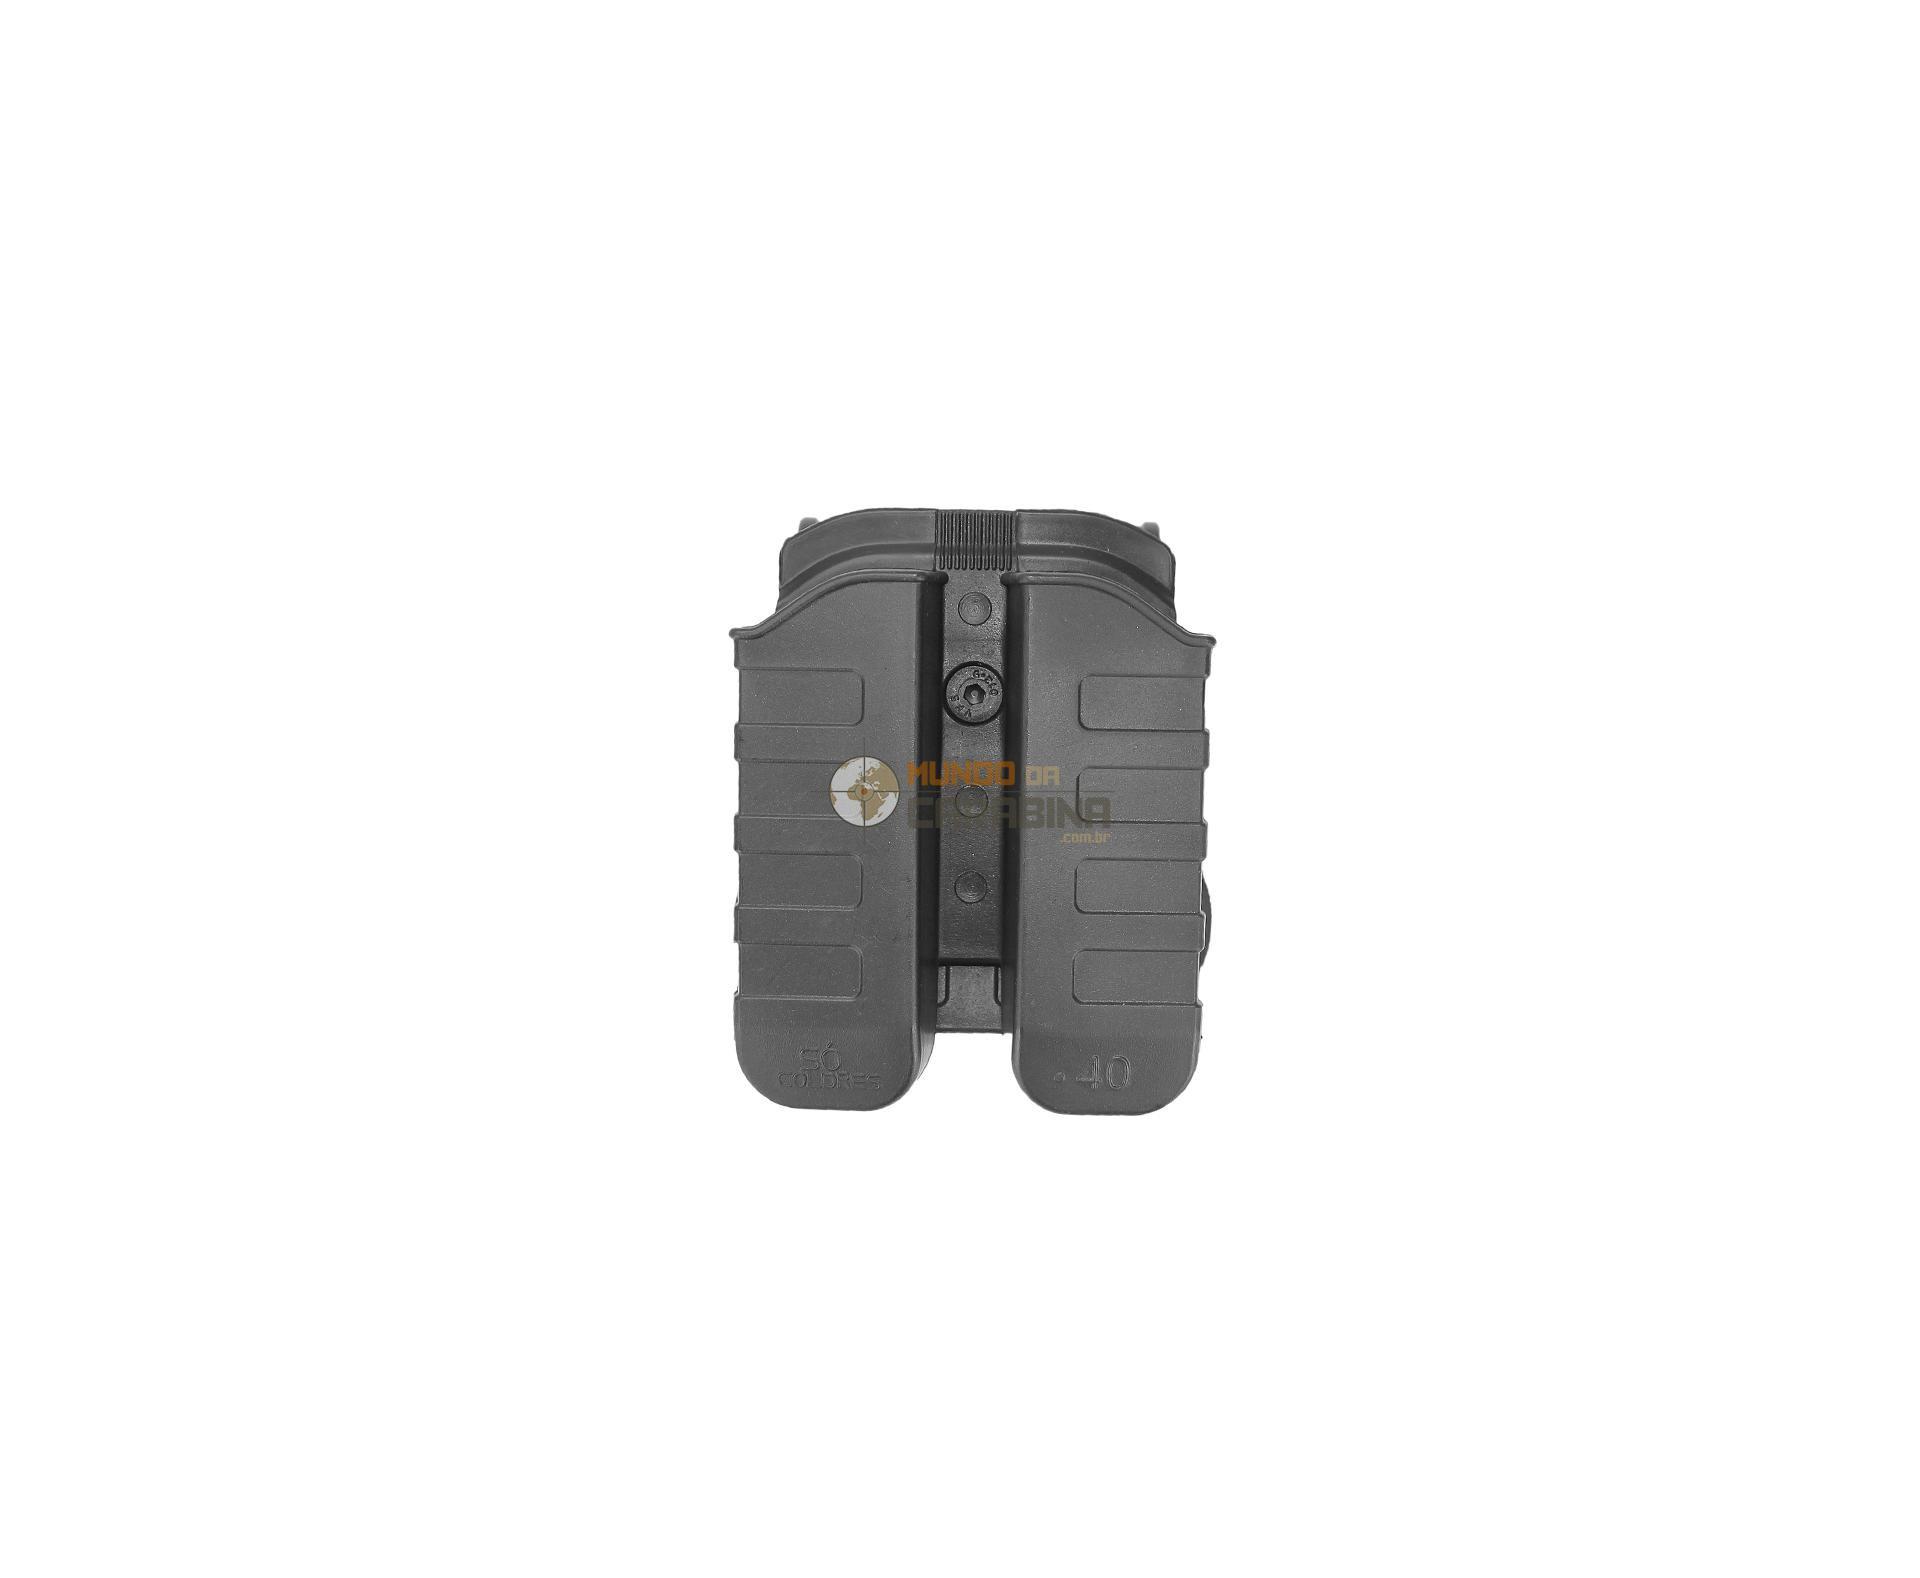 Porta Carregador Duplo Pistola Taurus .40 E 9mm - So Coldres